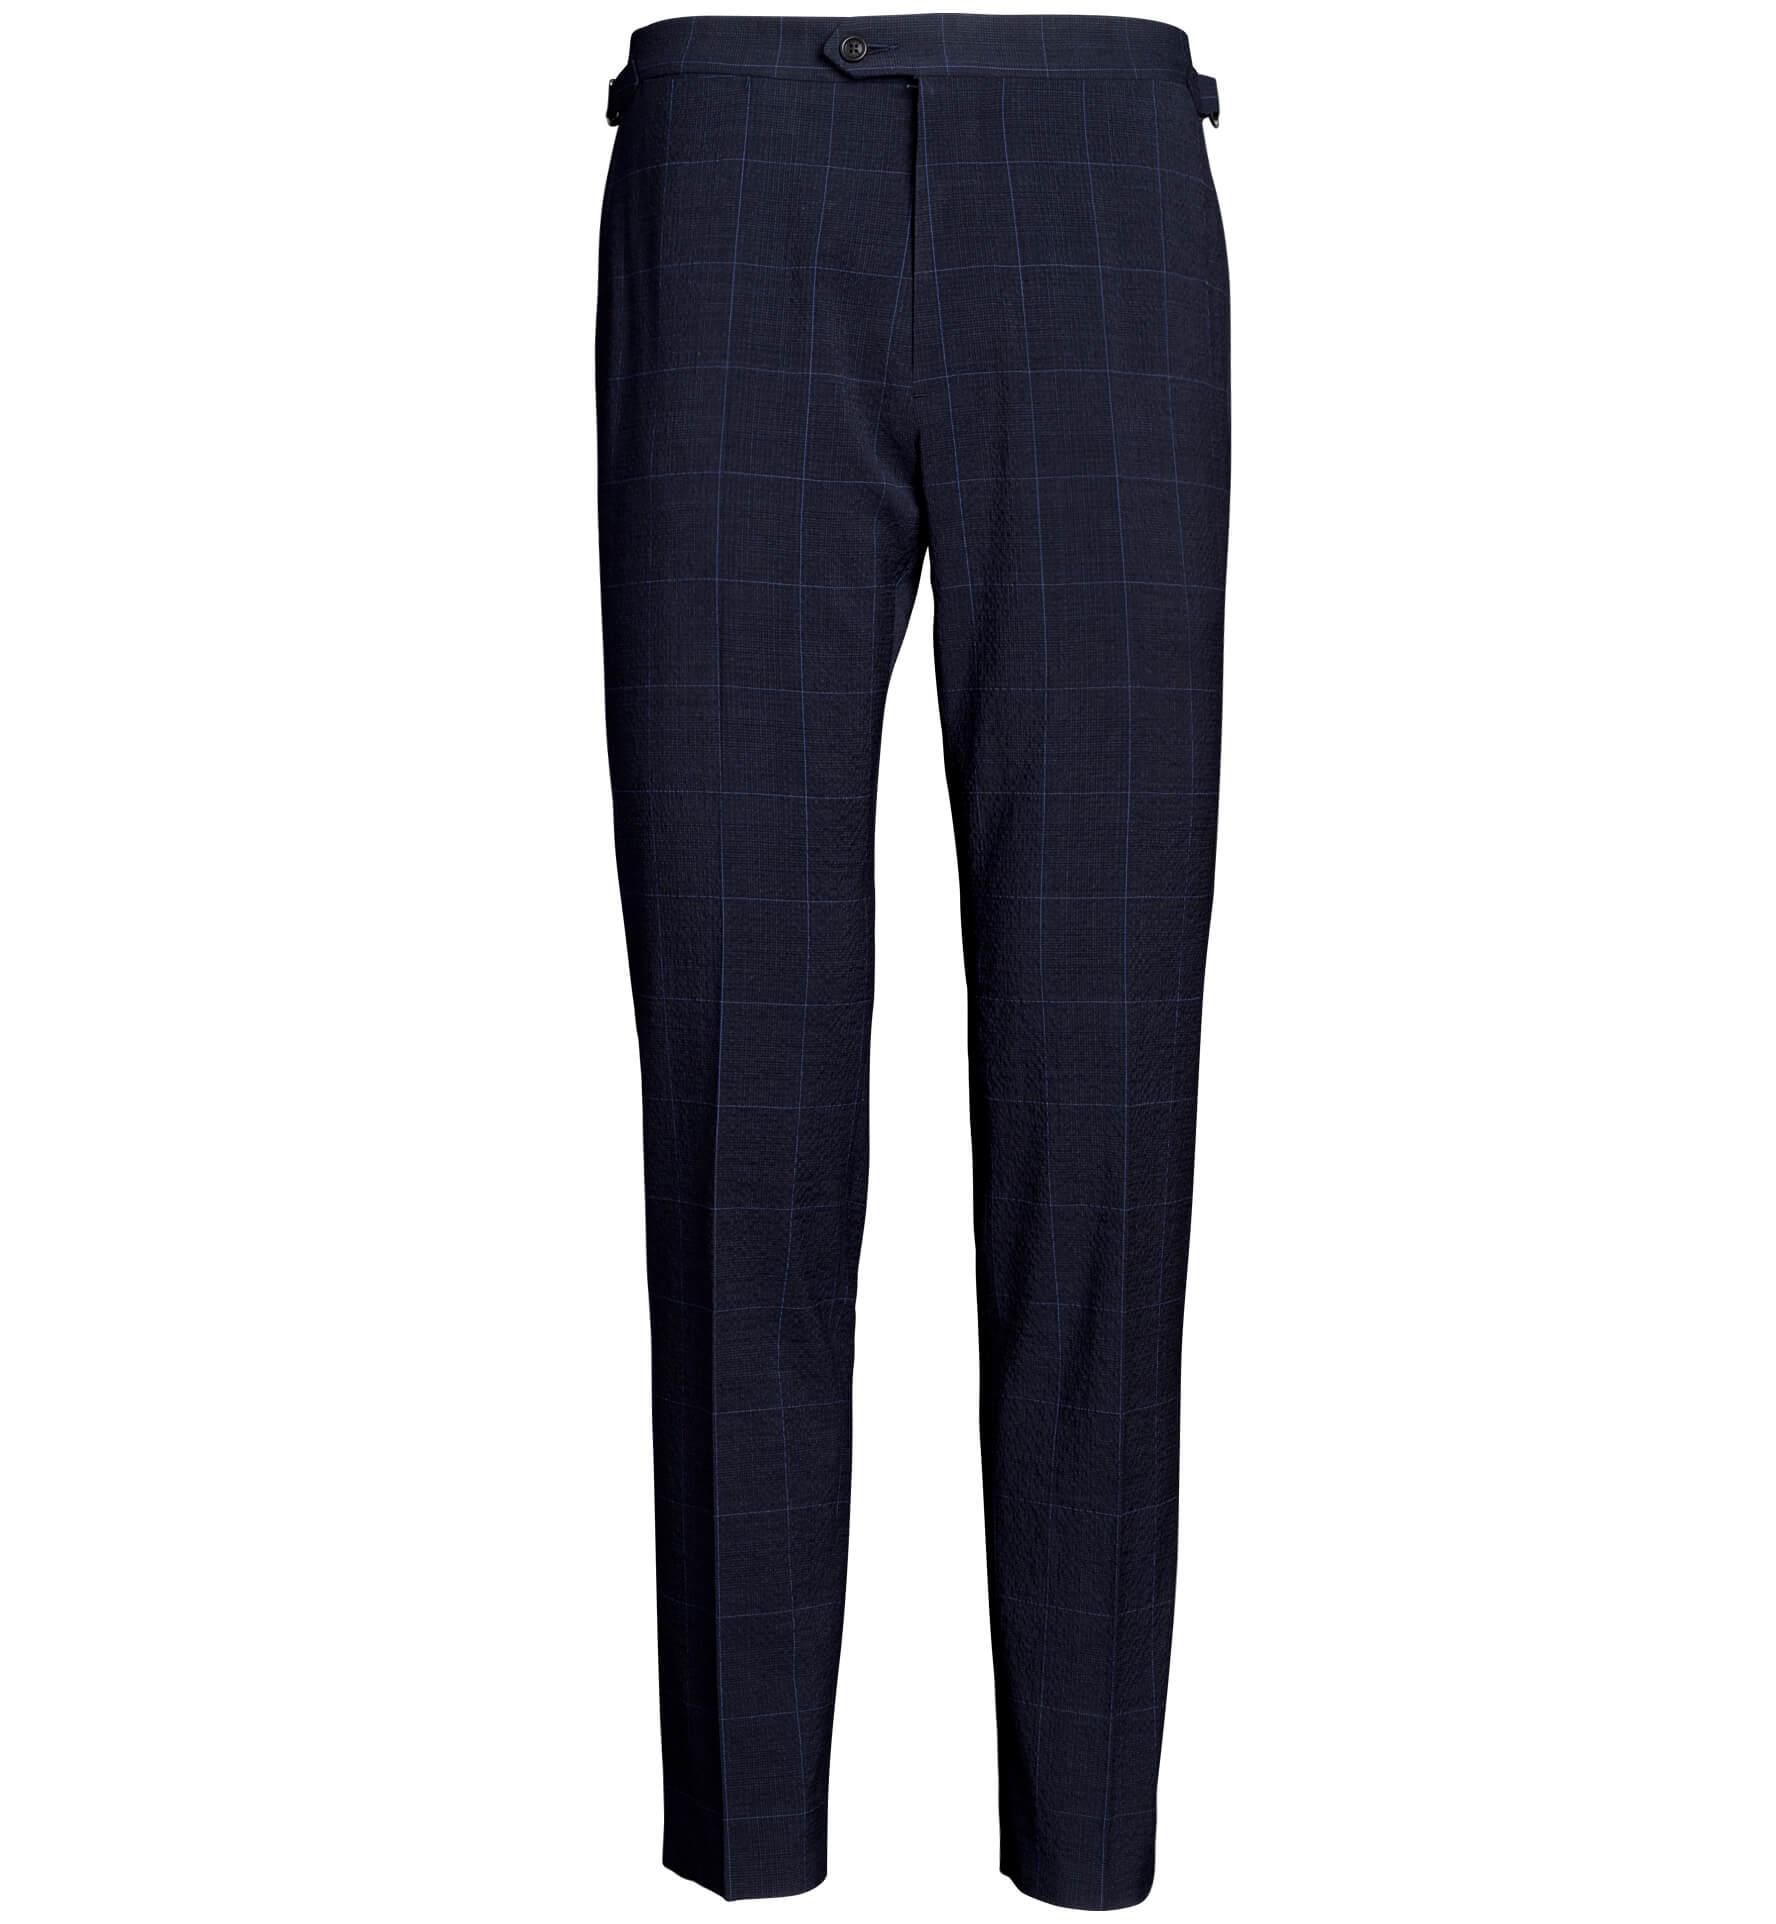 Zoom Image of Allen Navy Plaid Stretch Wool Seersucker Trouser